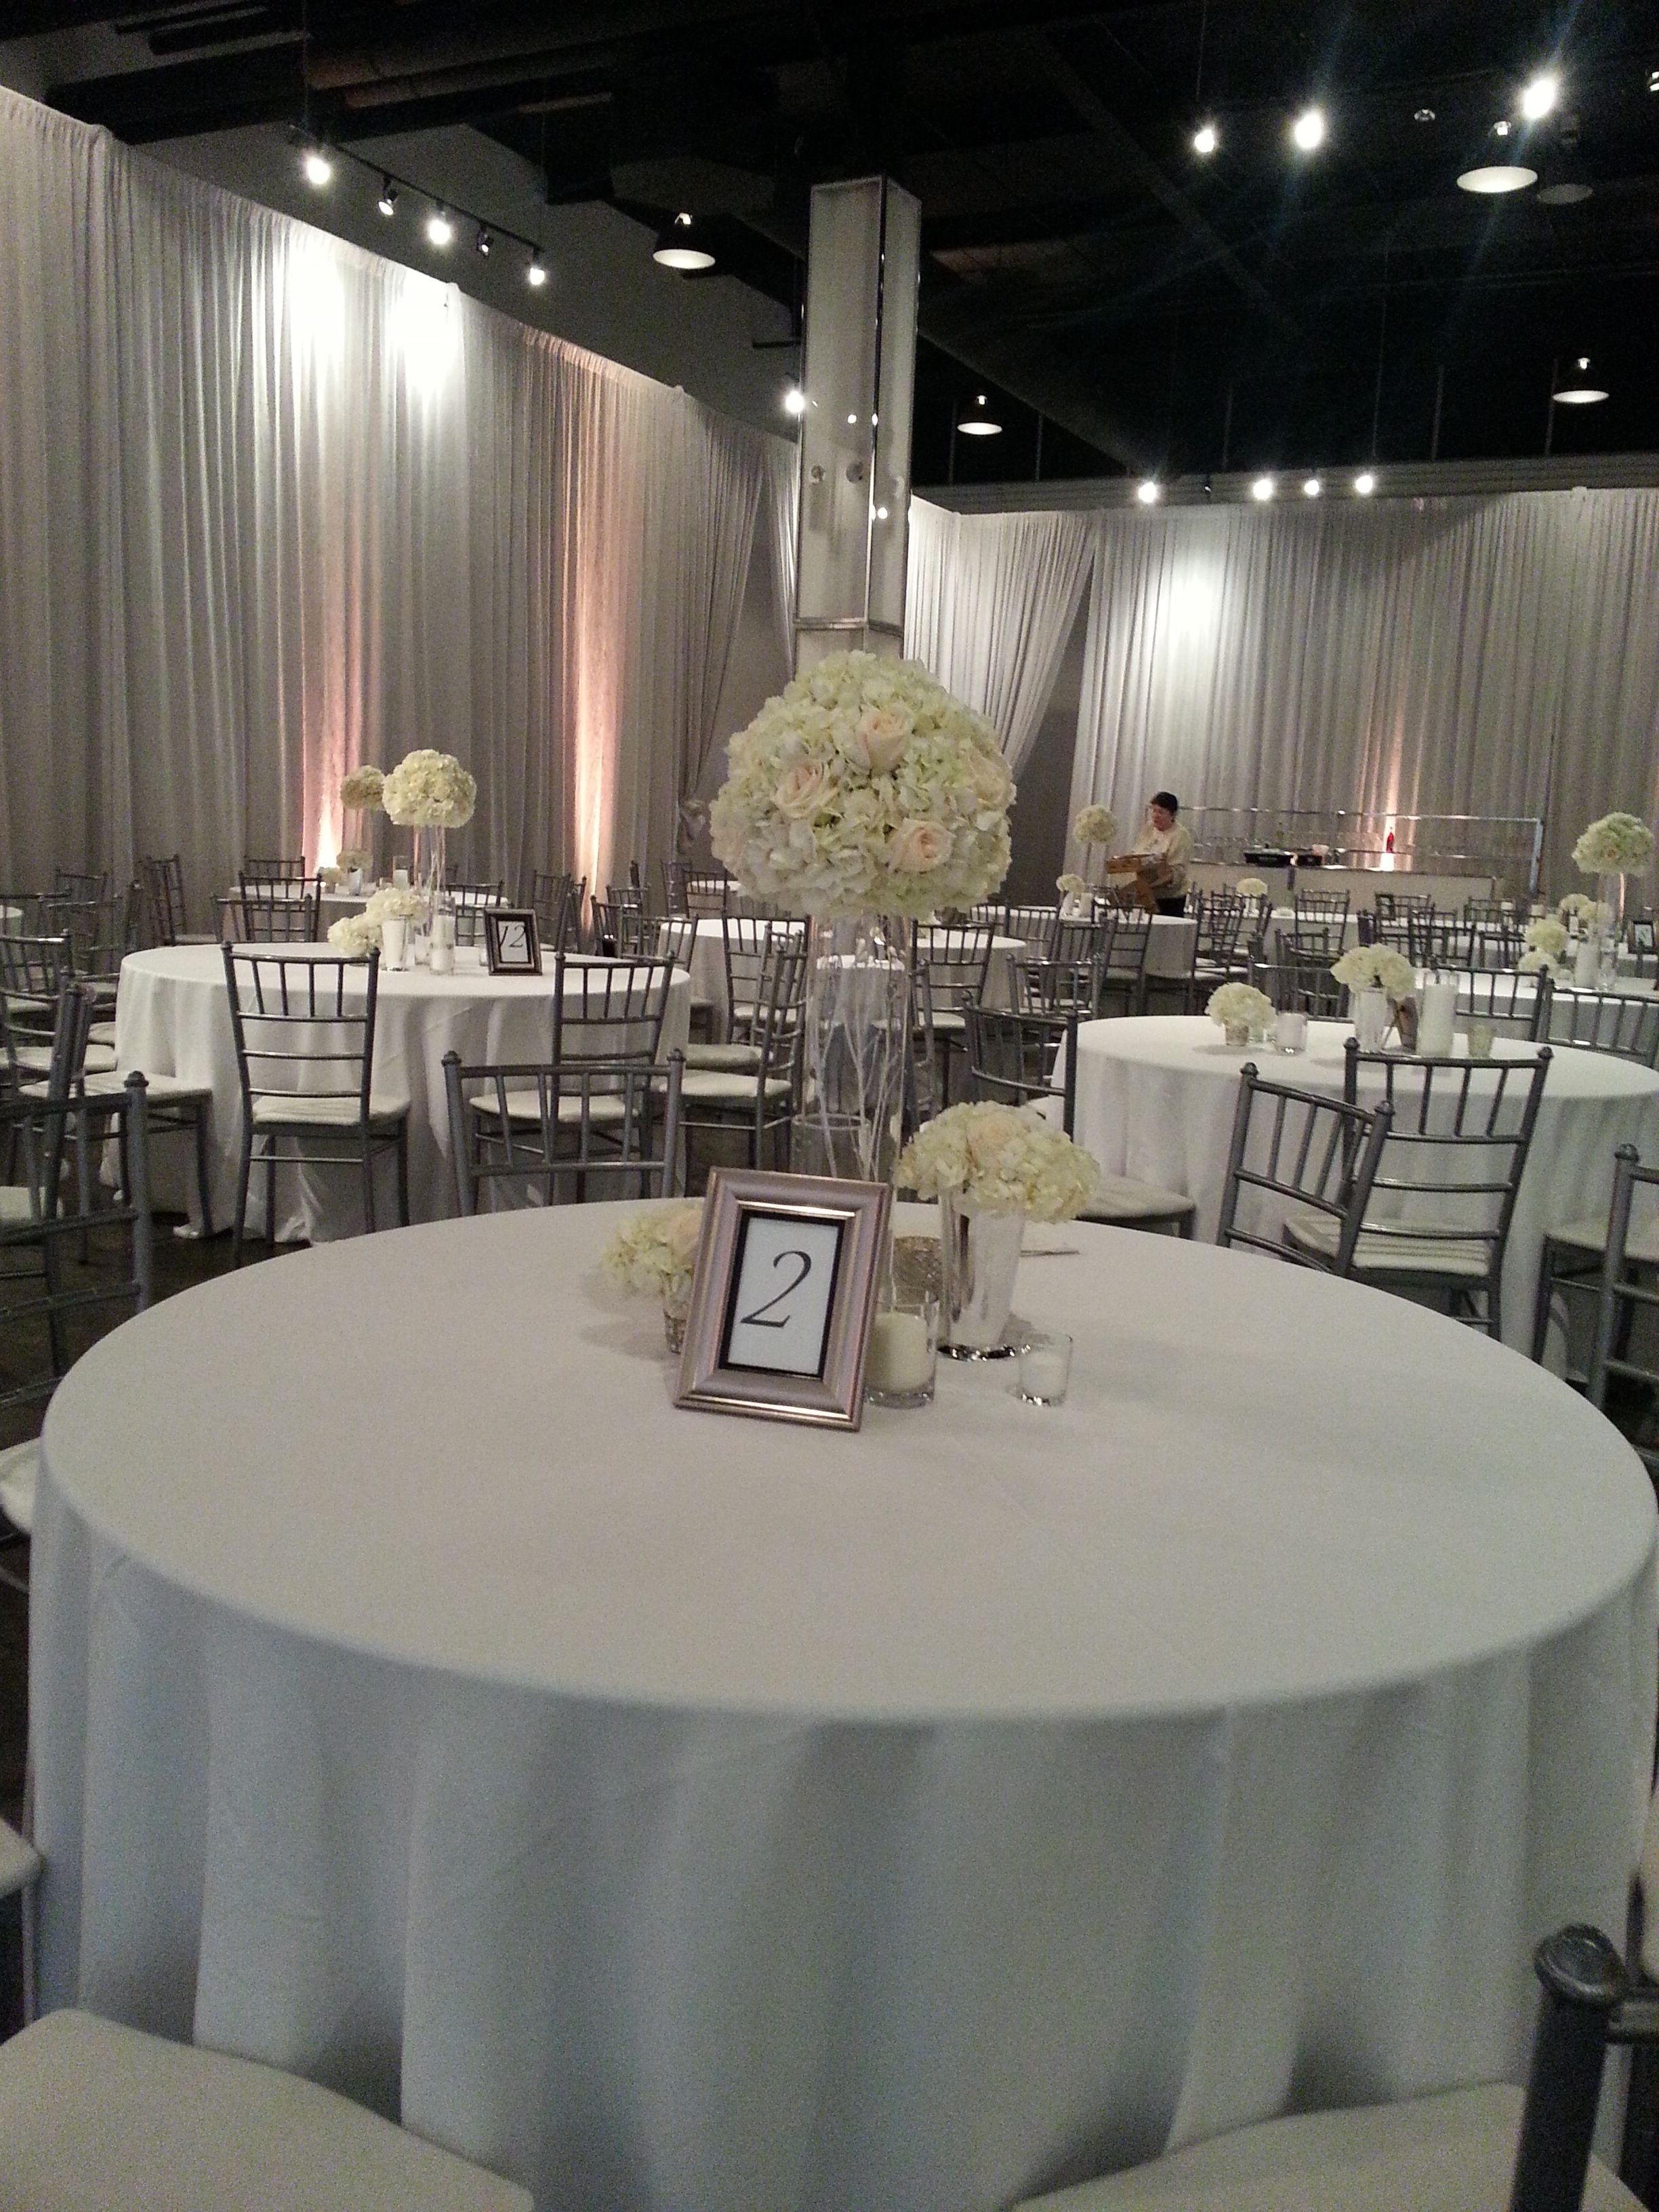 Winter Wedding At The Warehouse Event Venue Toronto Venue Www